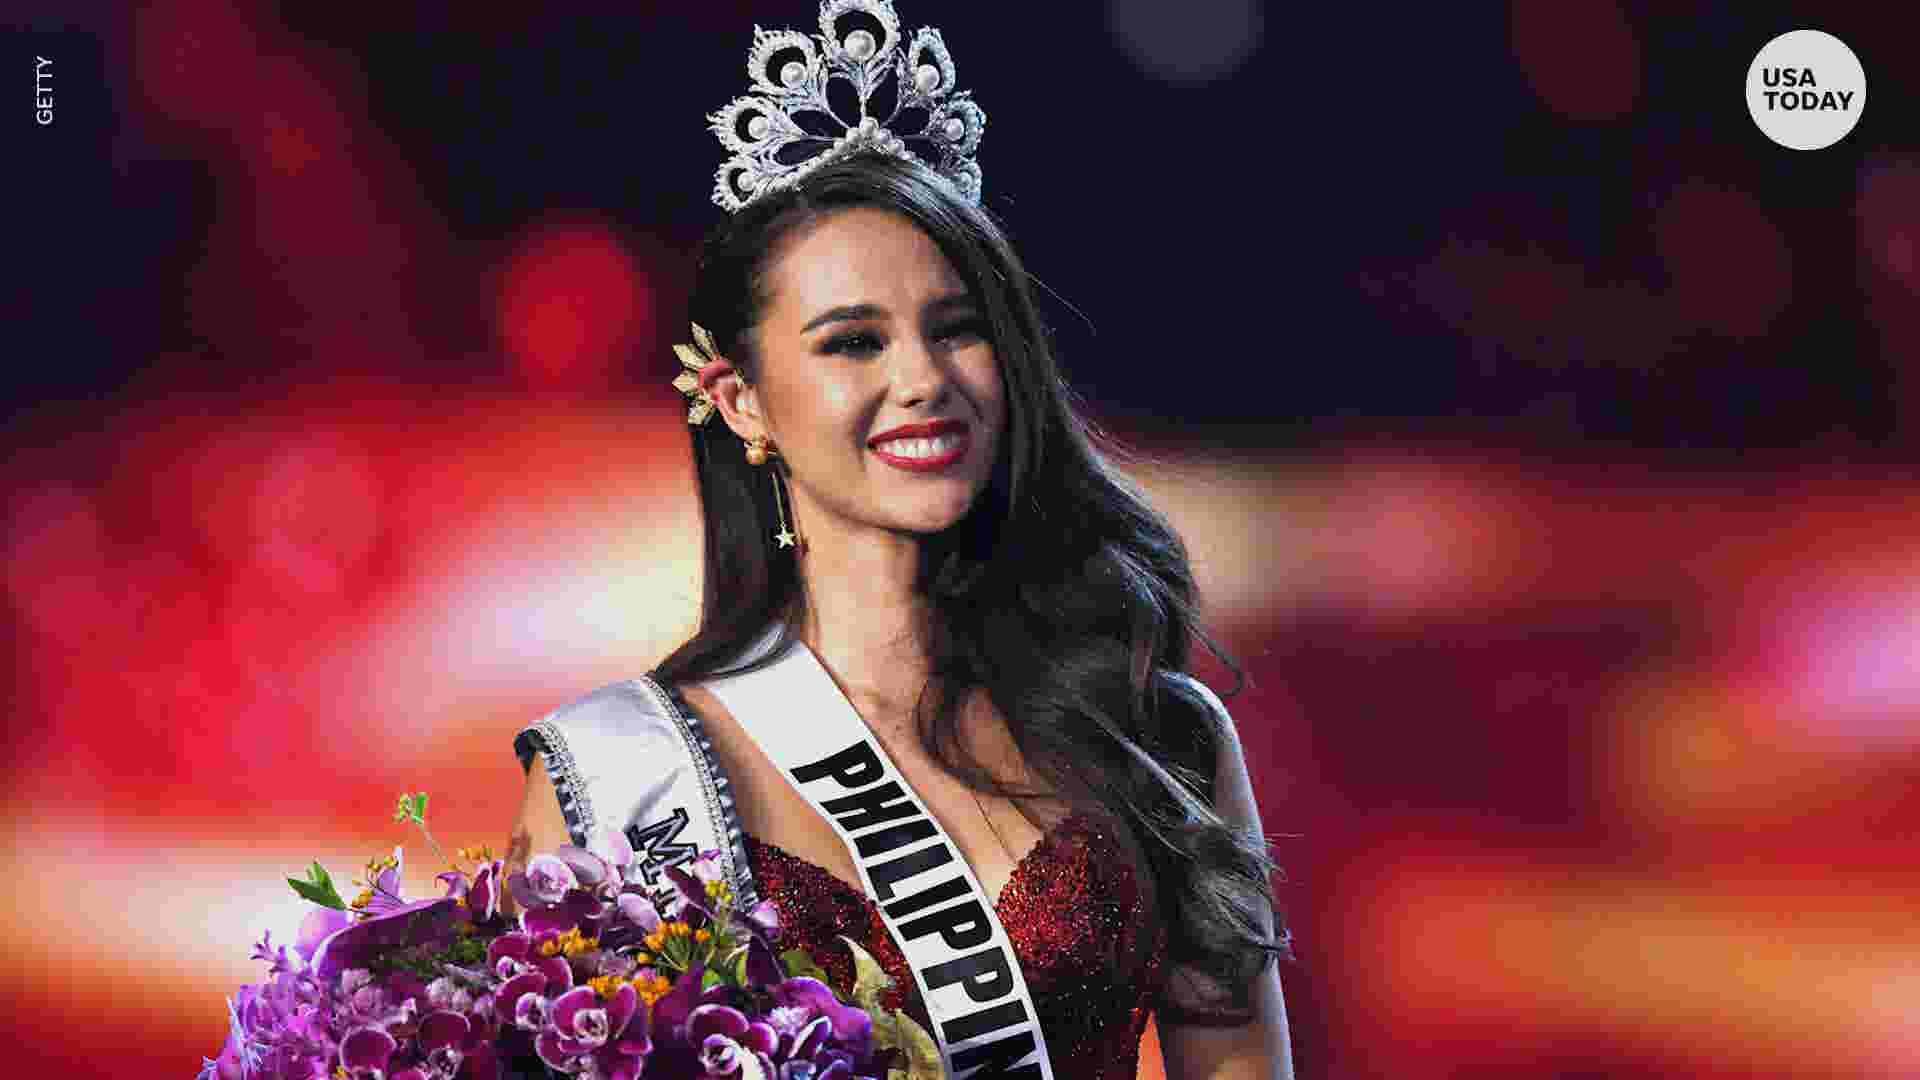 Miss Universe 2018 Philippines Catriona Gray Wins Steve Harvey Hosts